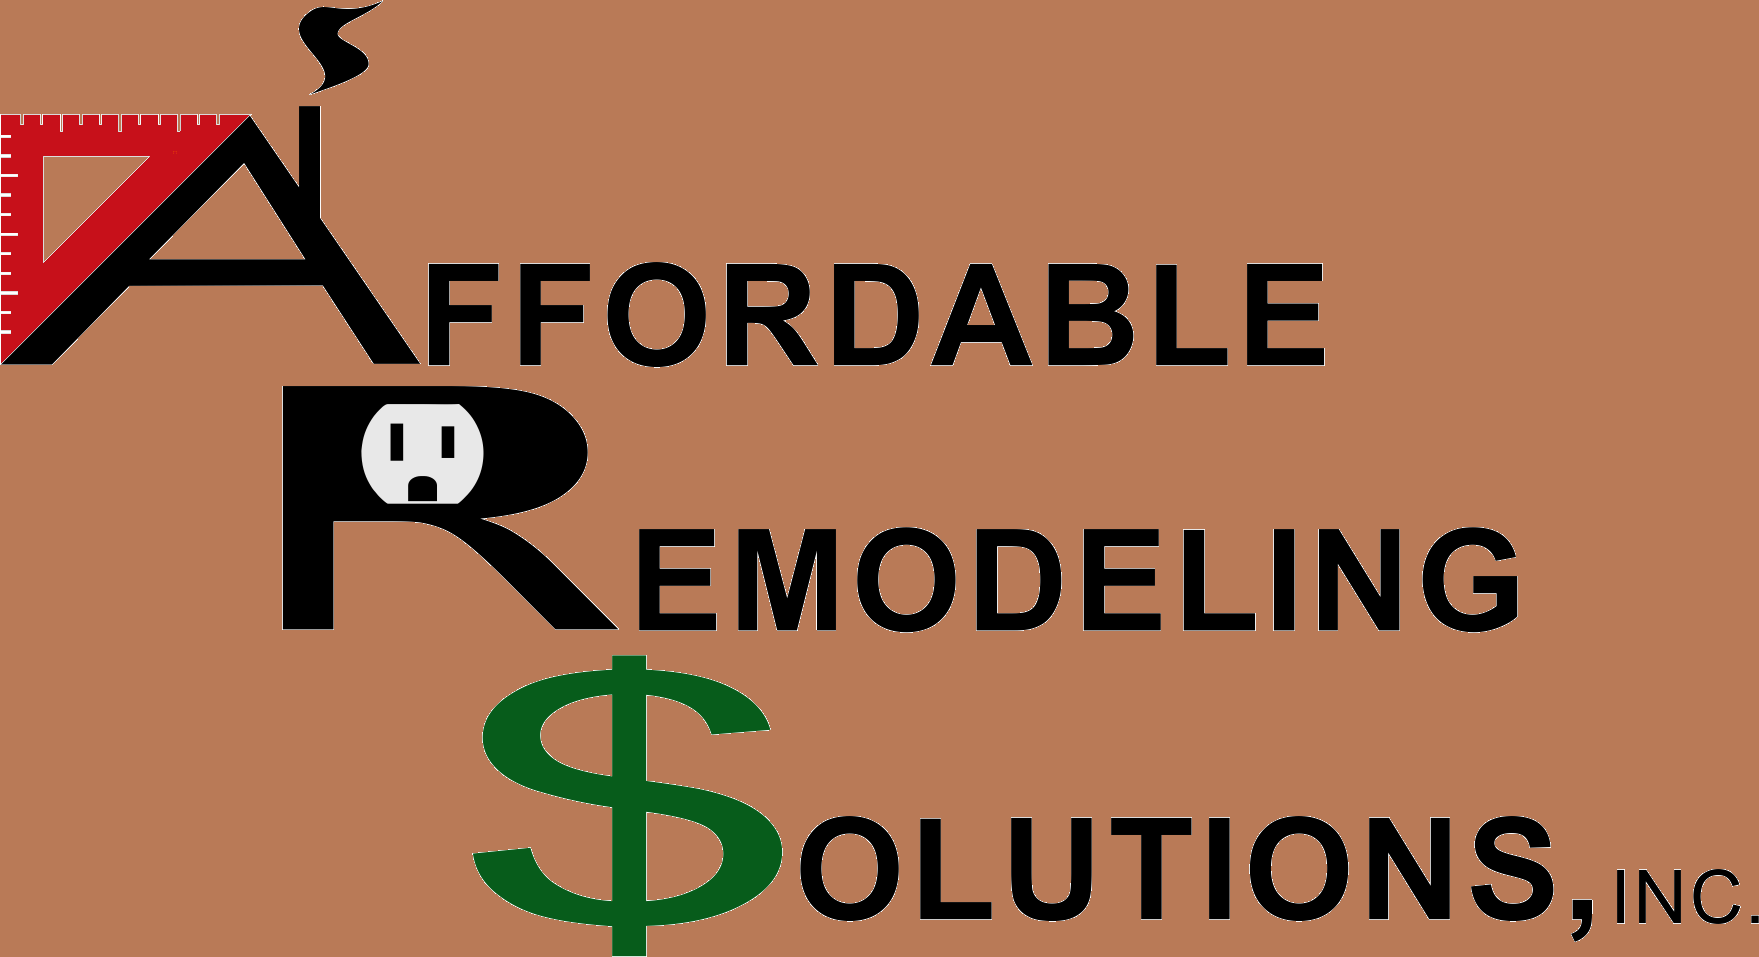 Affordable Remodeling Solutions, Inc. logo